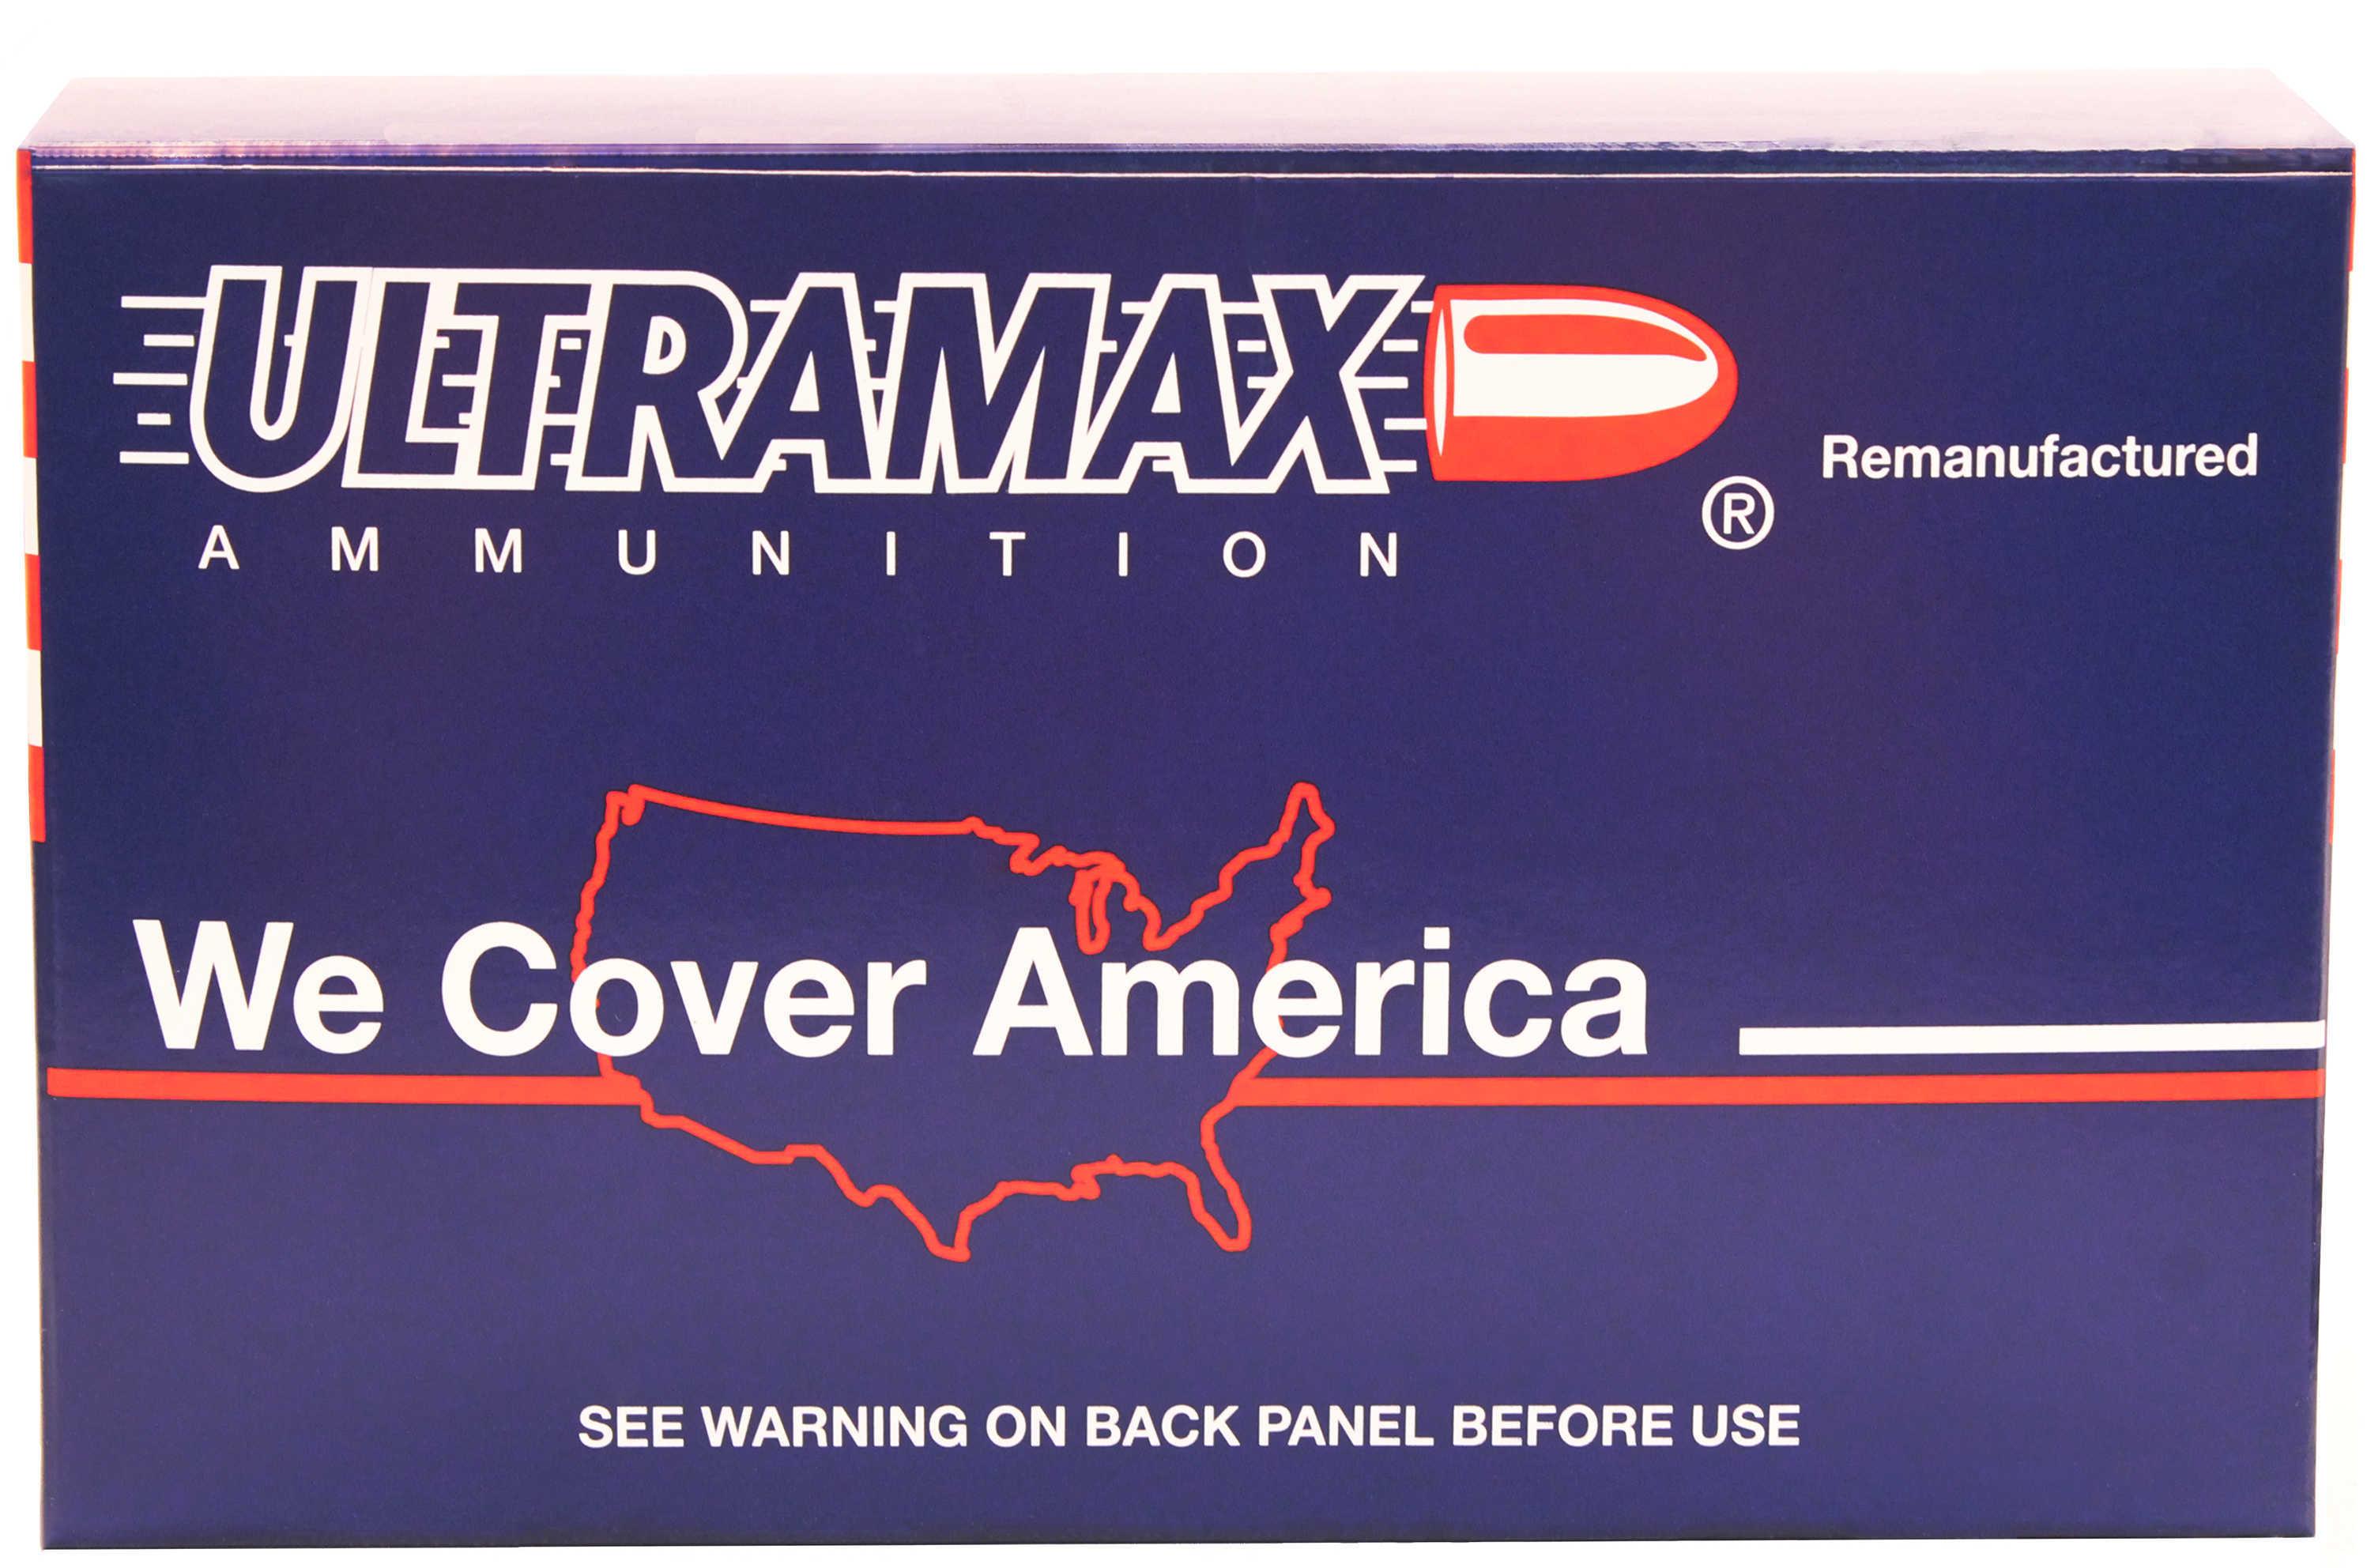 Ultramax 357 Sig Remanufactured 125 Grain Full Metal Jacket Ammo, 250 Rounds Md: ABI357SR2-250